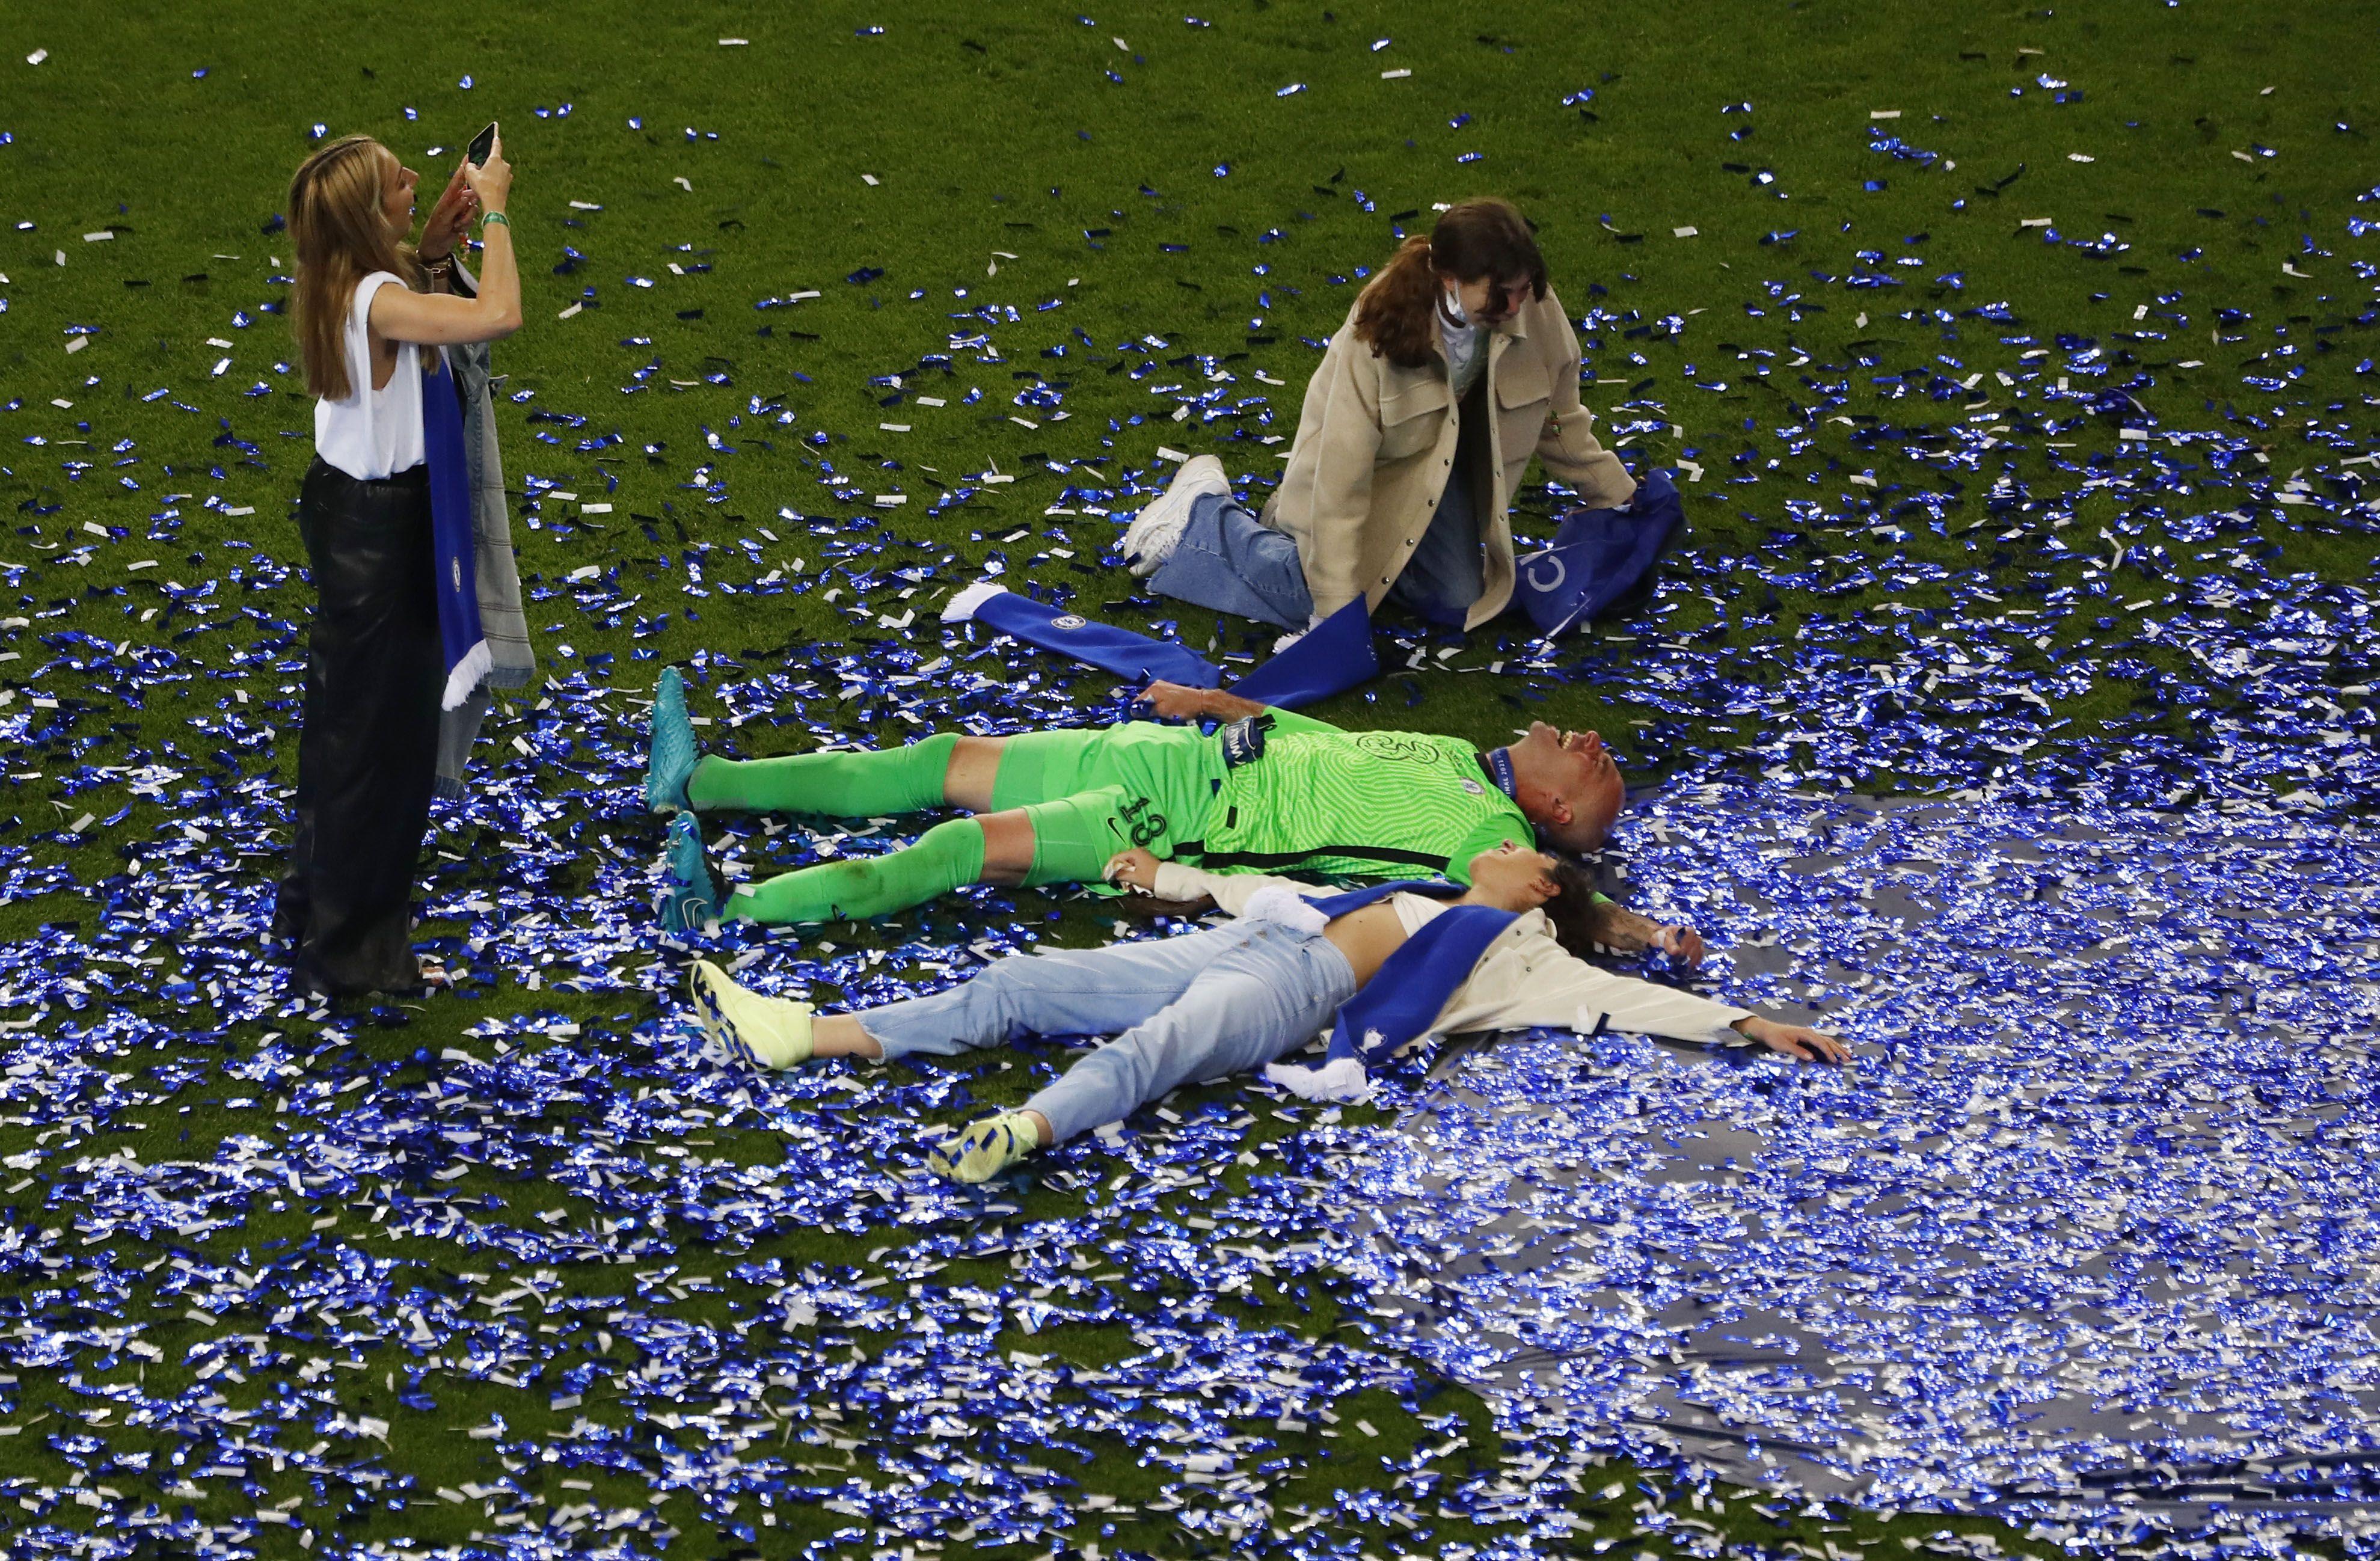 Caballero disfruta en familia tras la final de la Champions (REUTERS/Susana Vera)